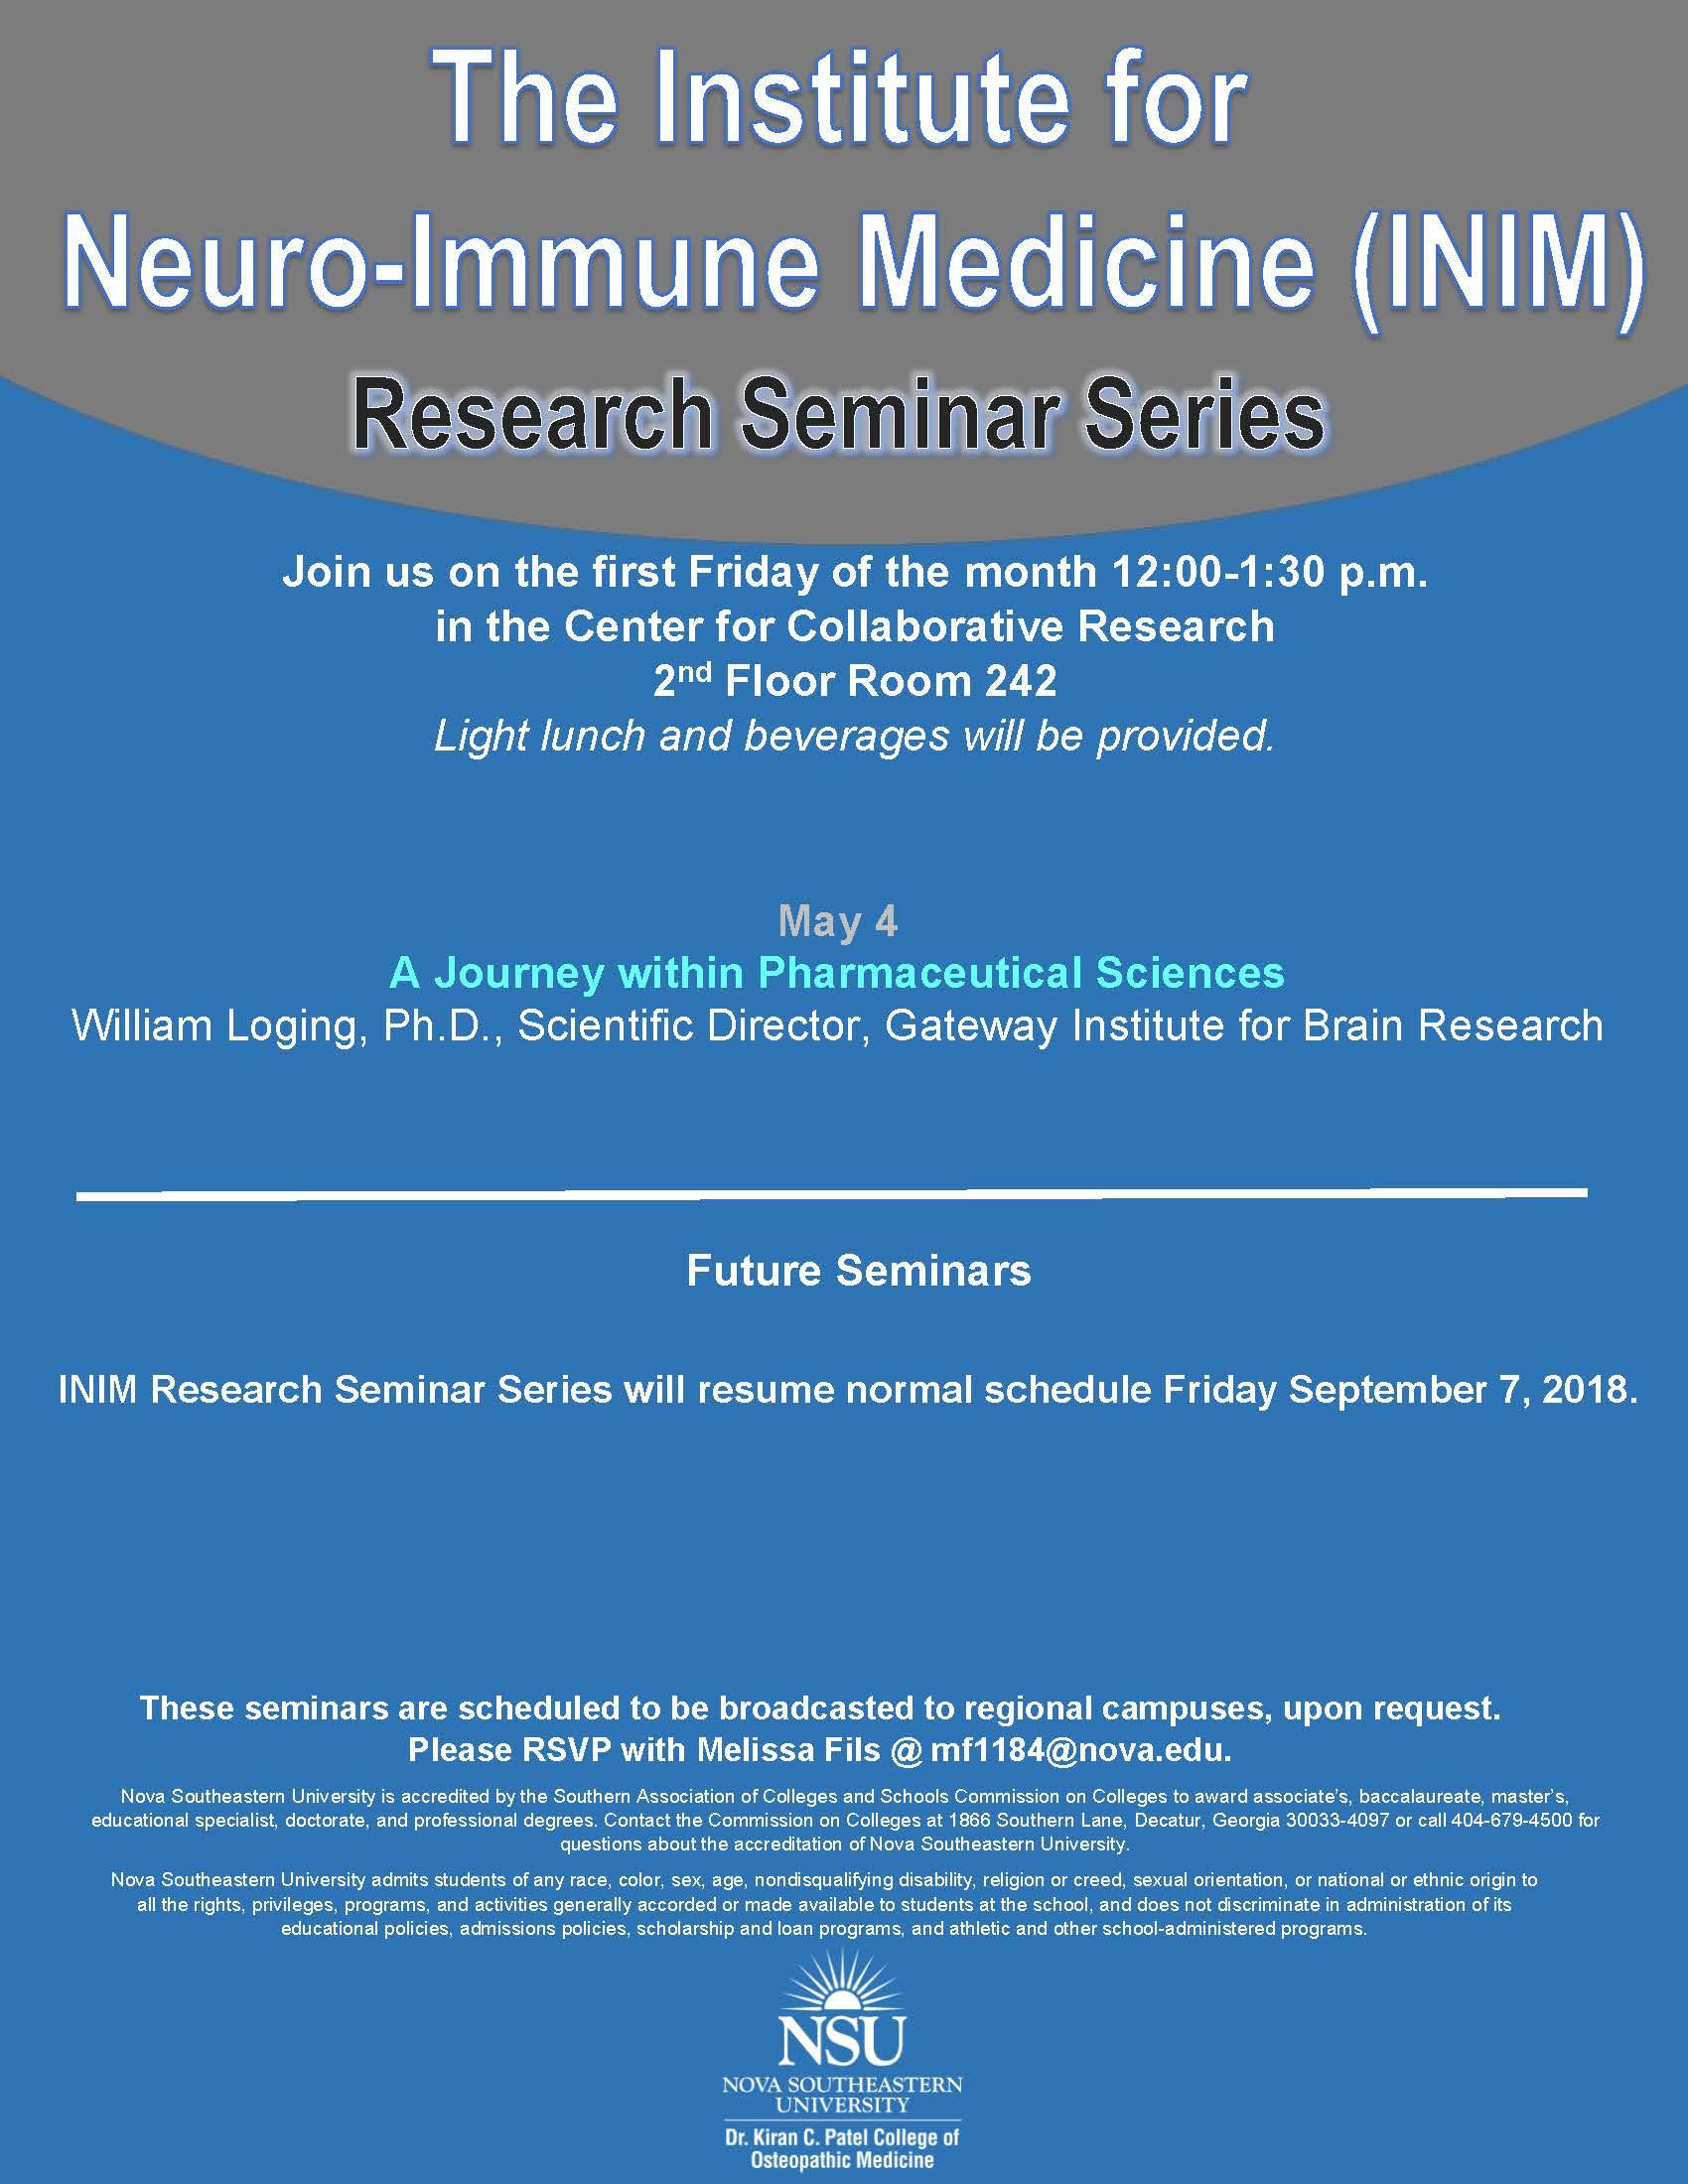 NSU Institute for Neuro-Immune Medicine Hosts Monthly Seminar, May 4 ...